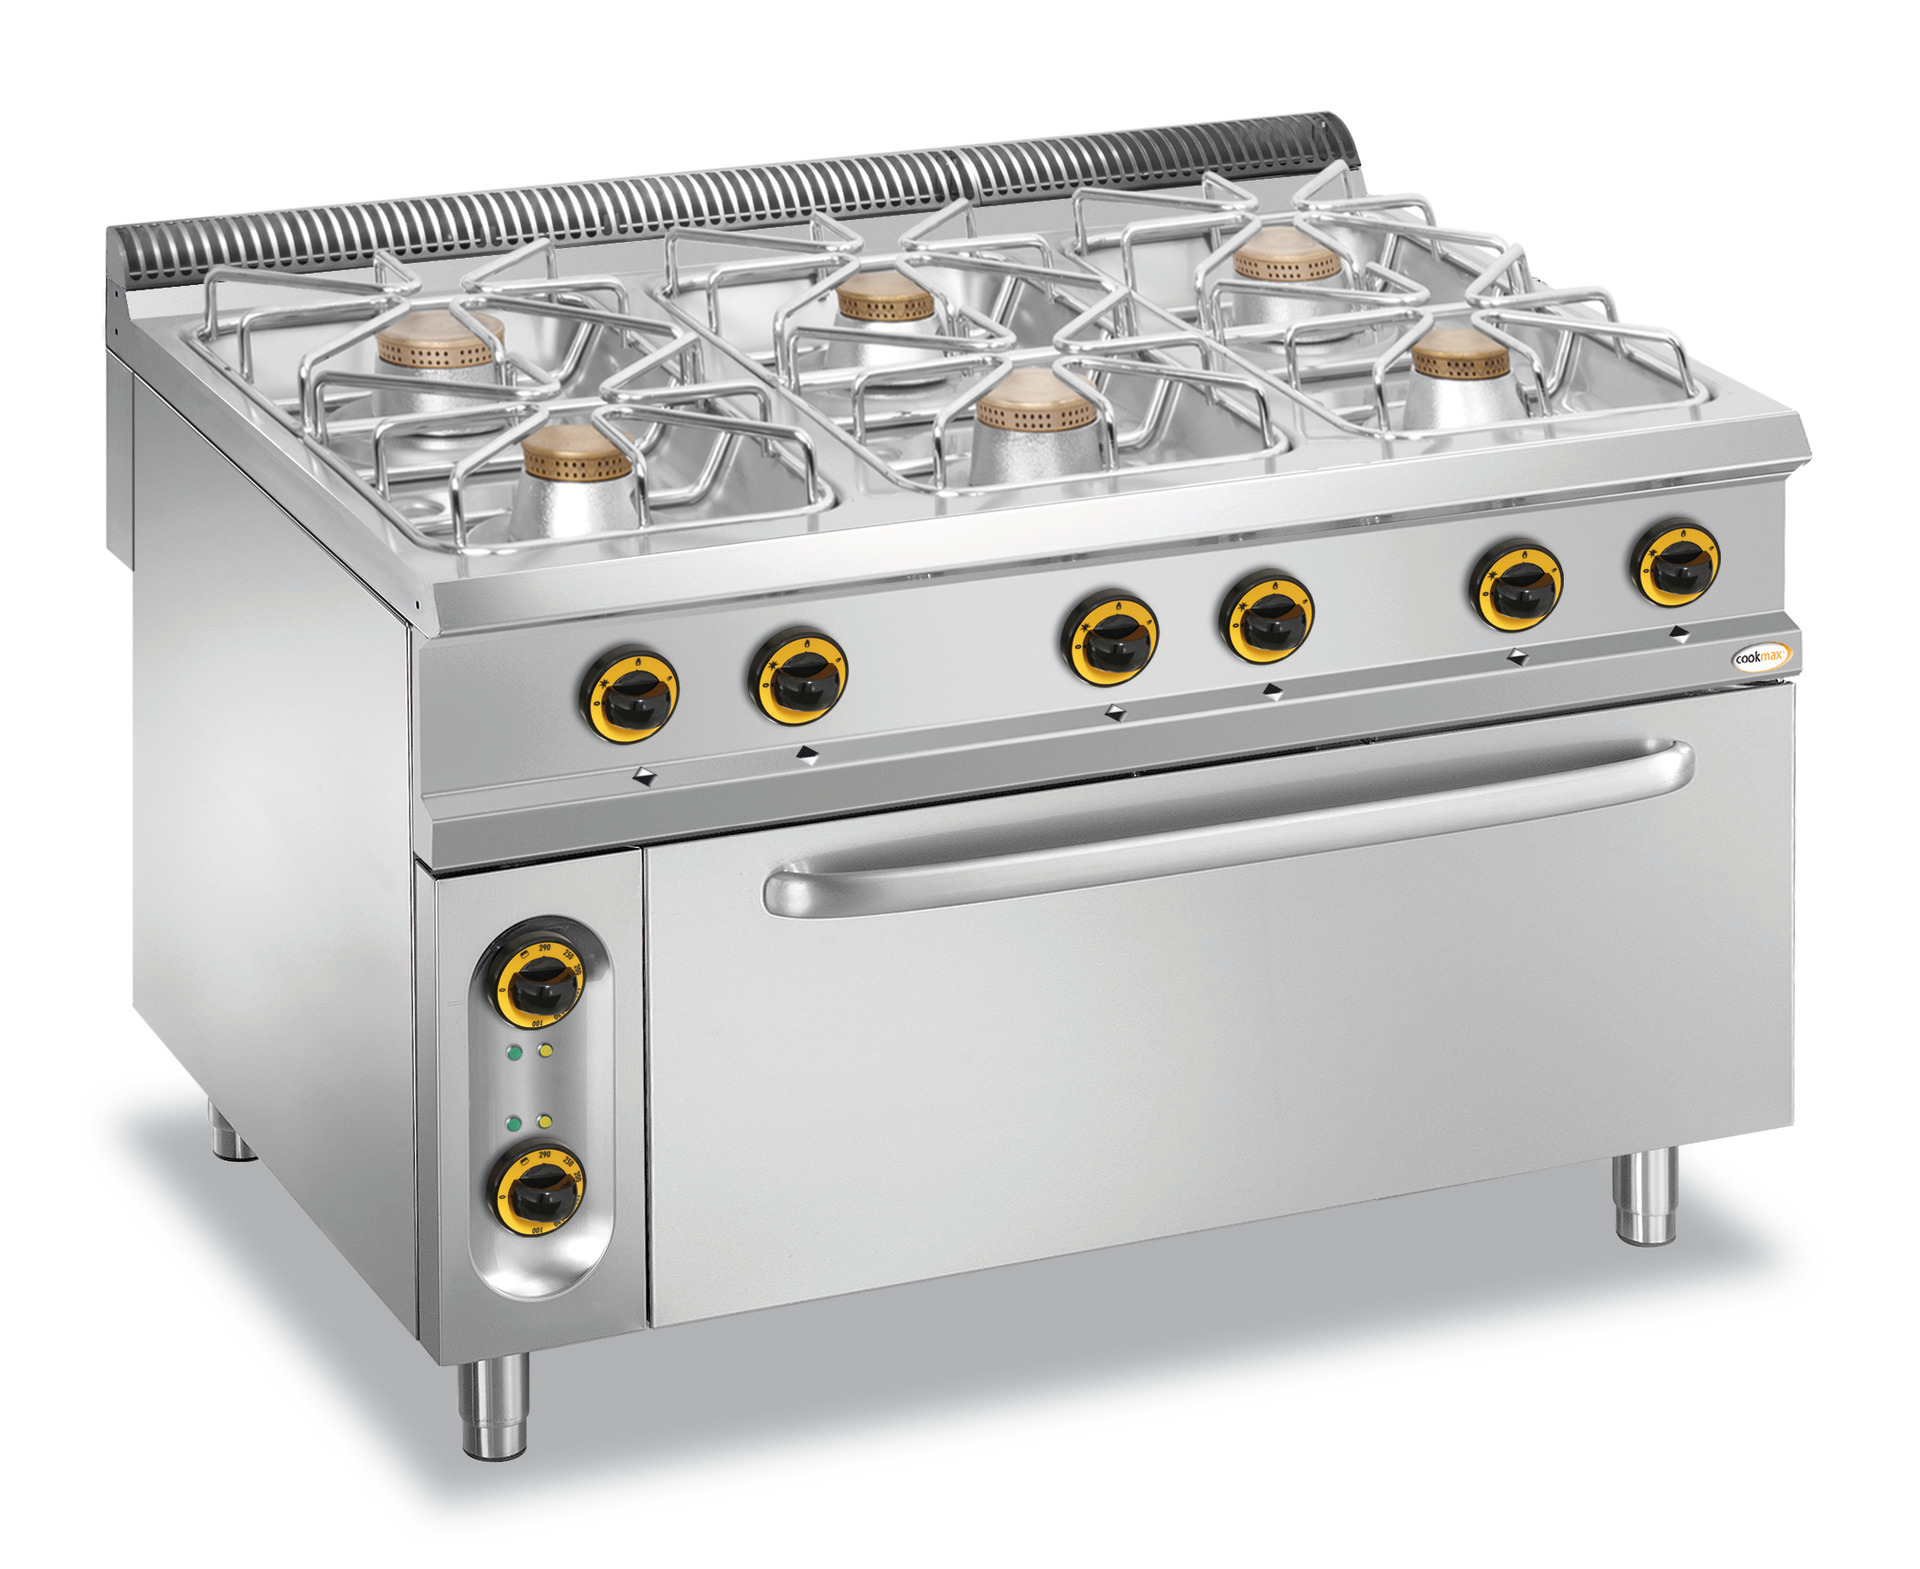 Gas-Herd 6 Brenner Maxi-Gas-Backofen mit Grill 1200 x 900 x 850 mm